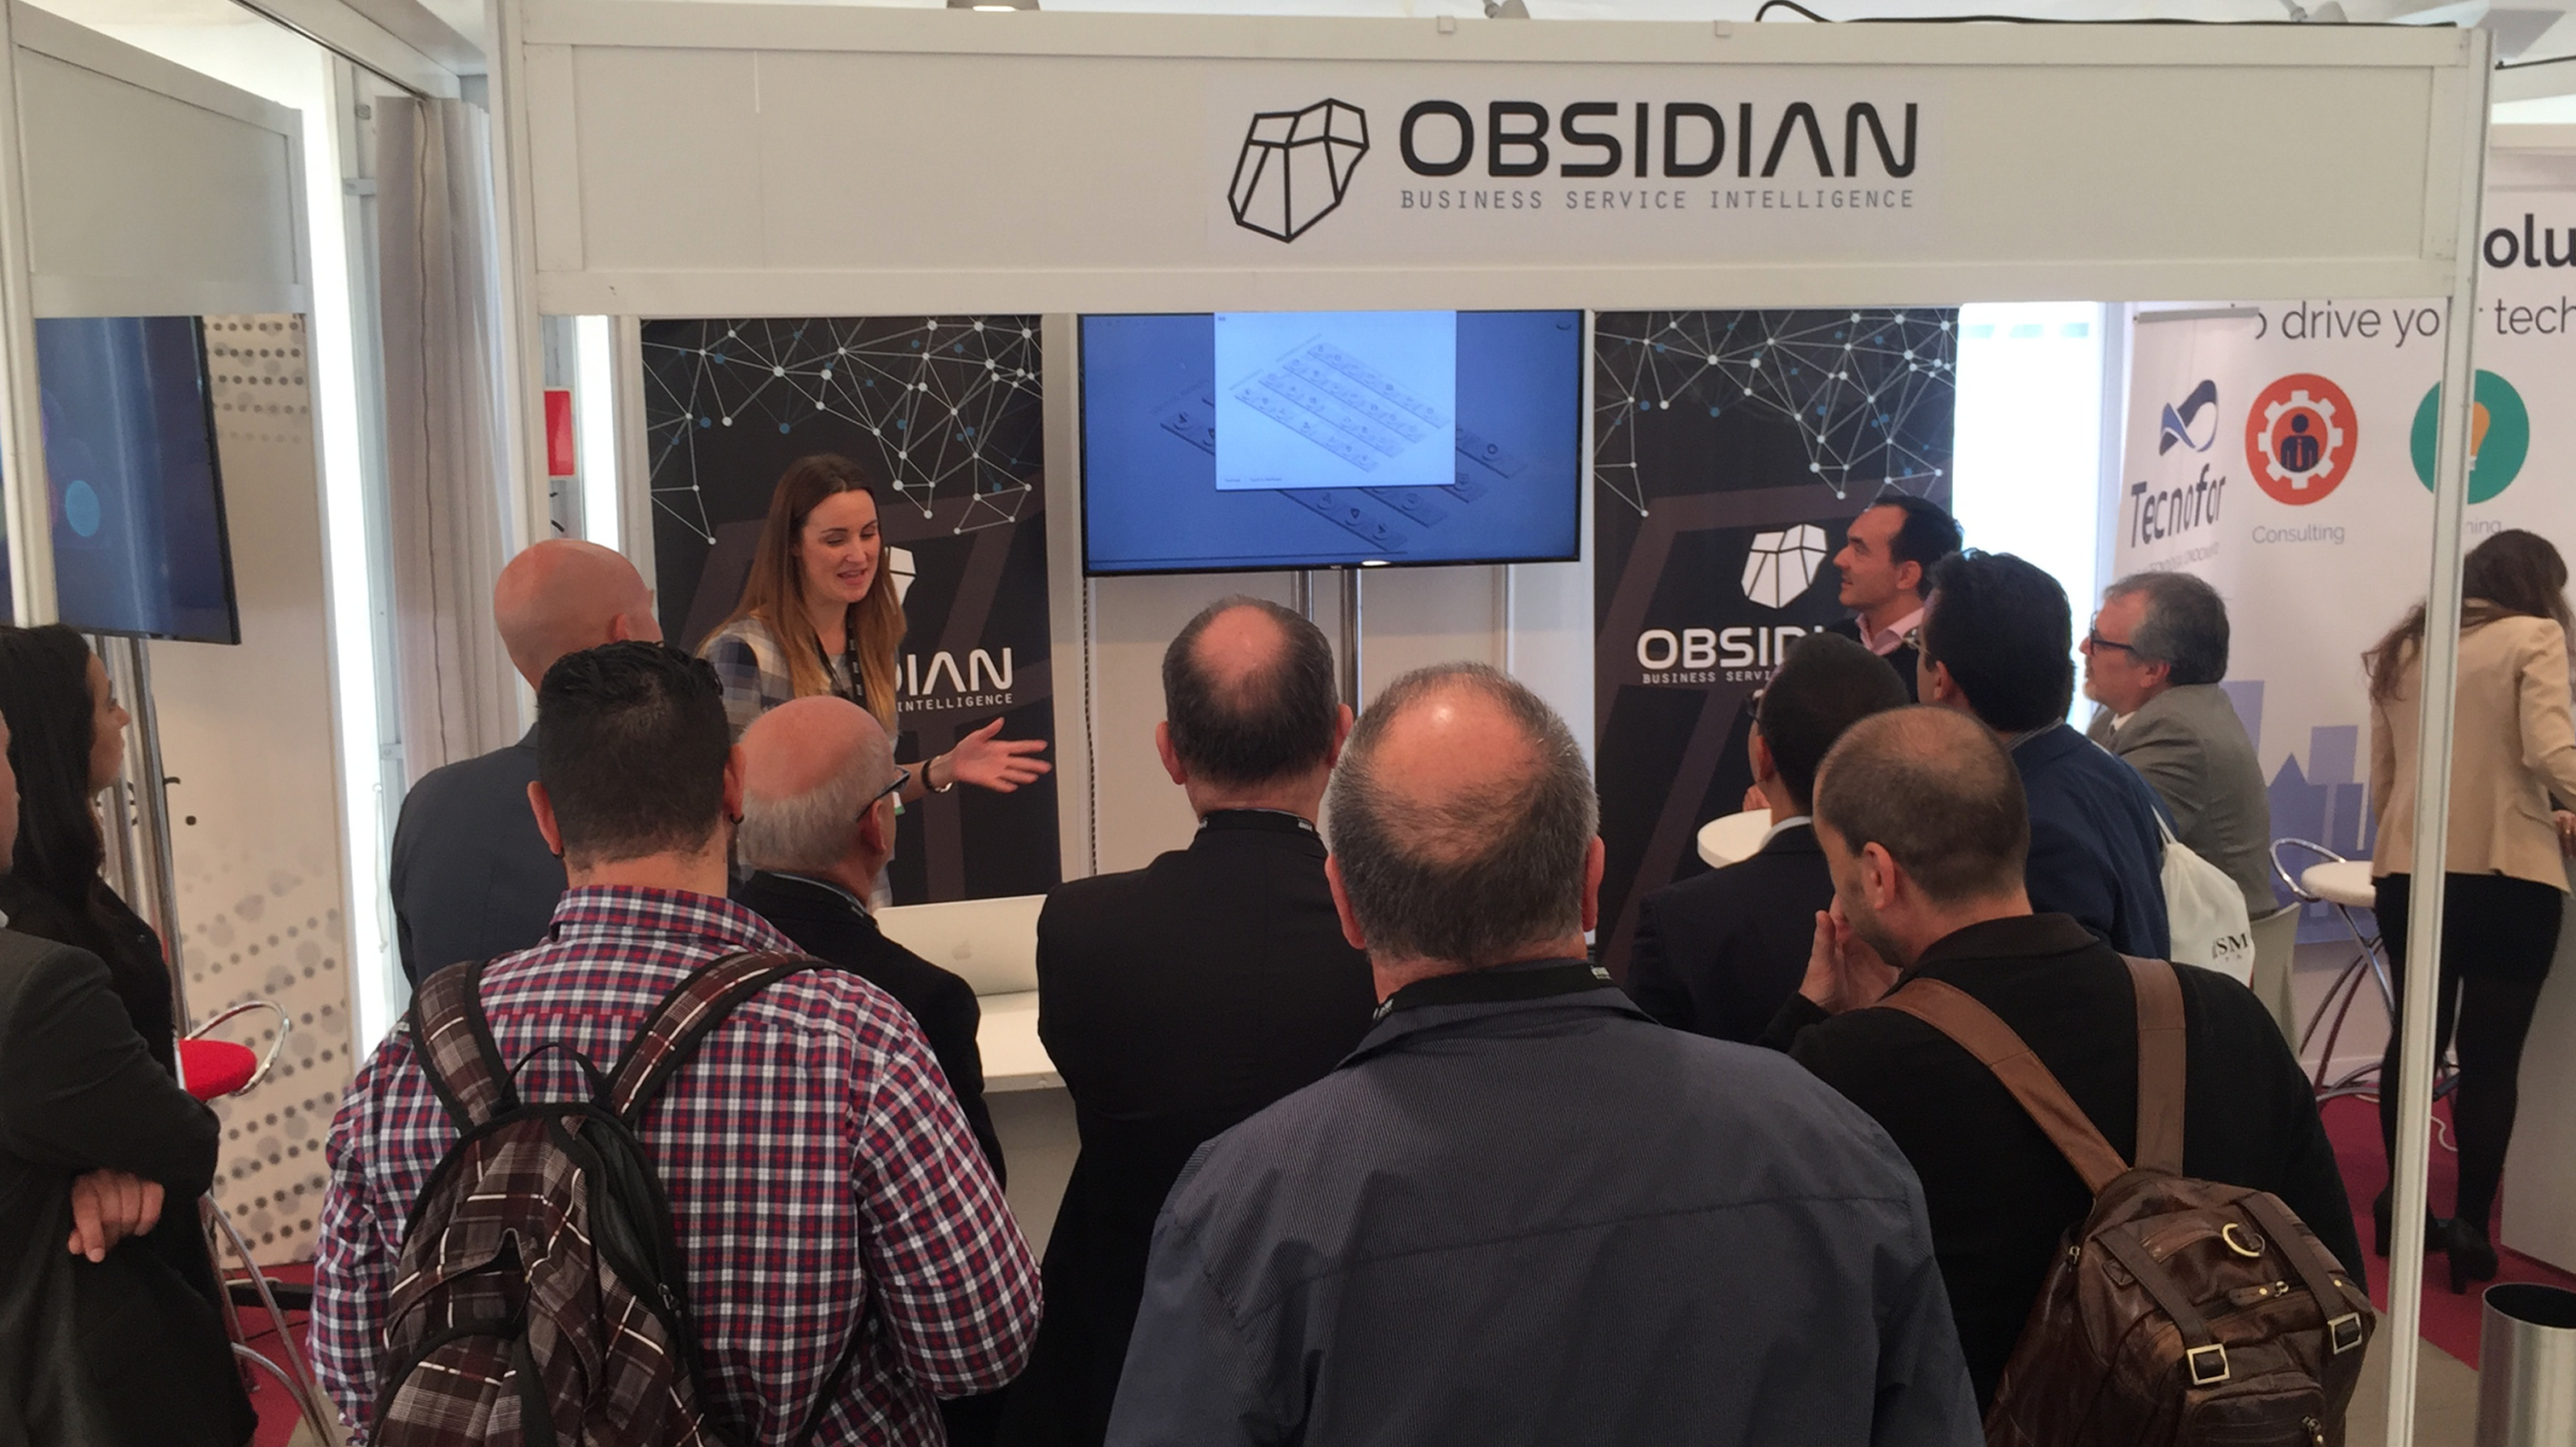 Obsidian, patrocinador de ouro da Vision17 da itSMF Espanha